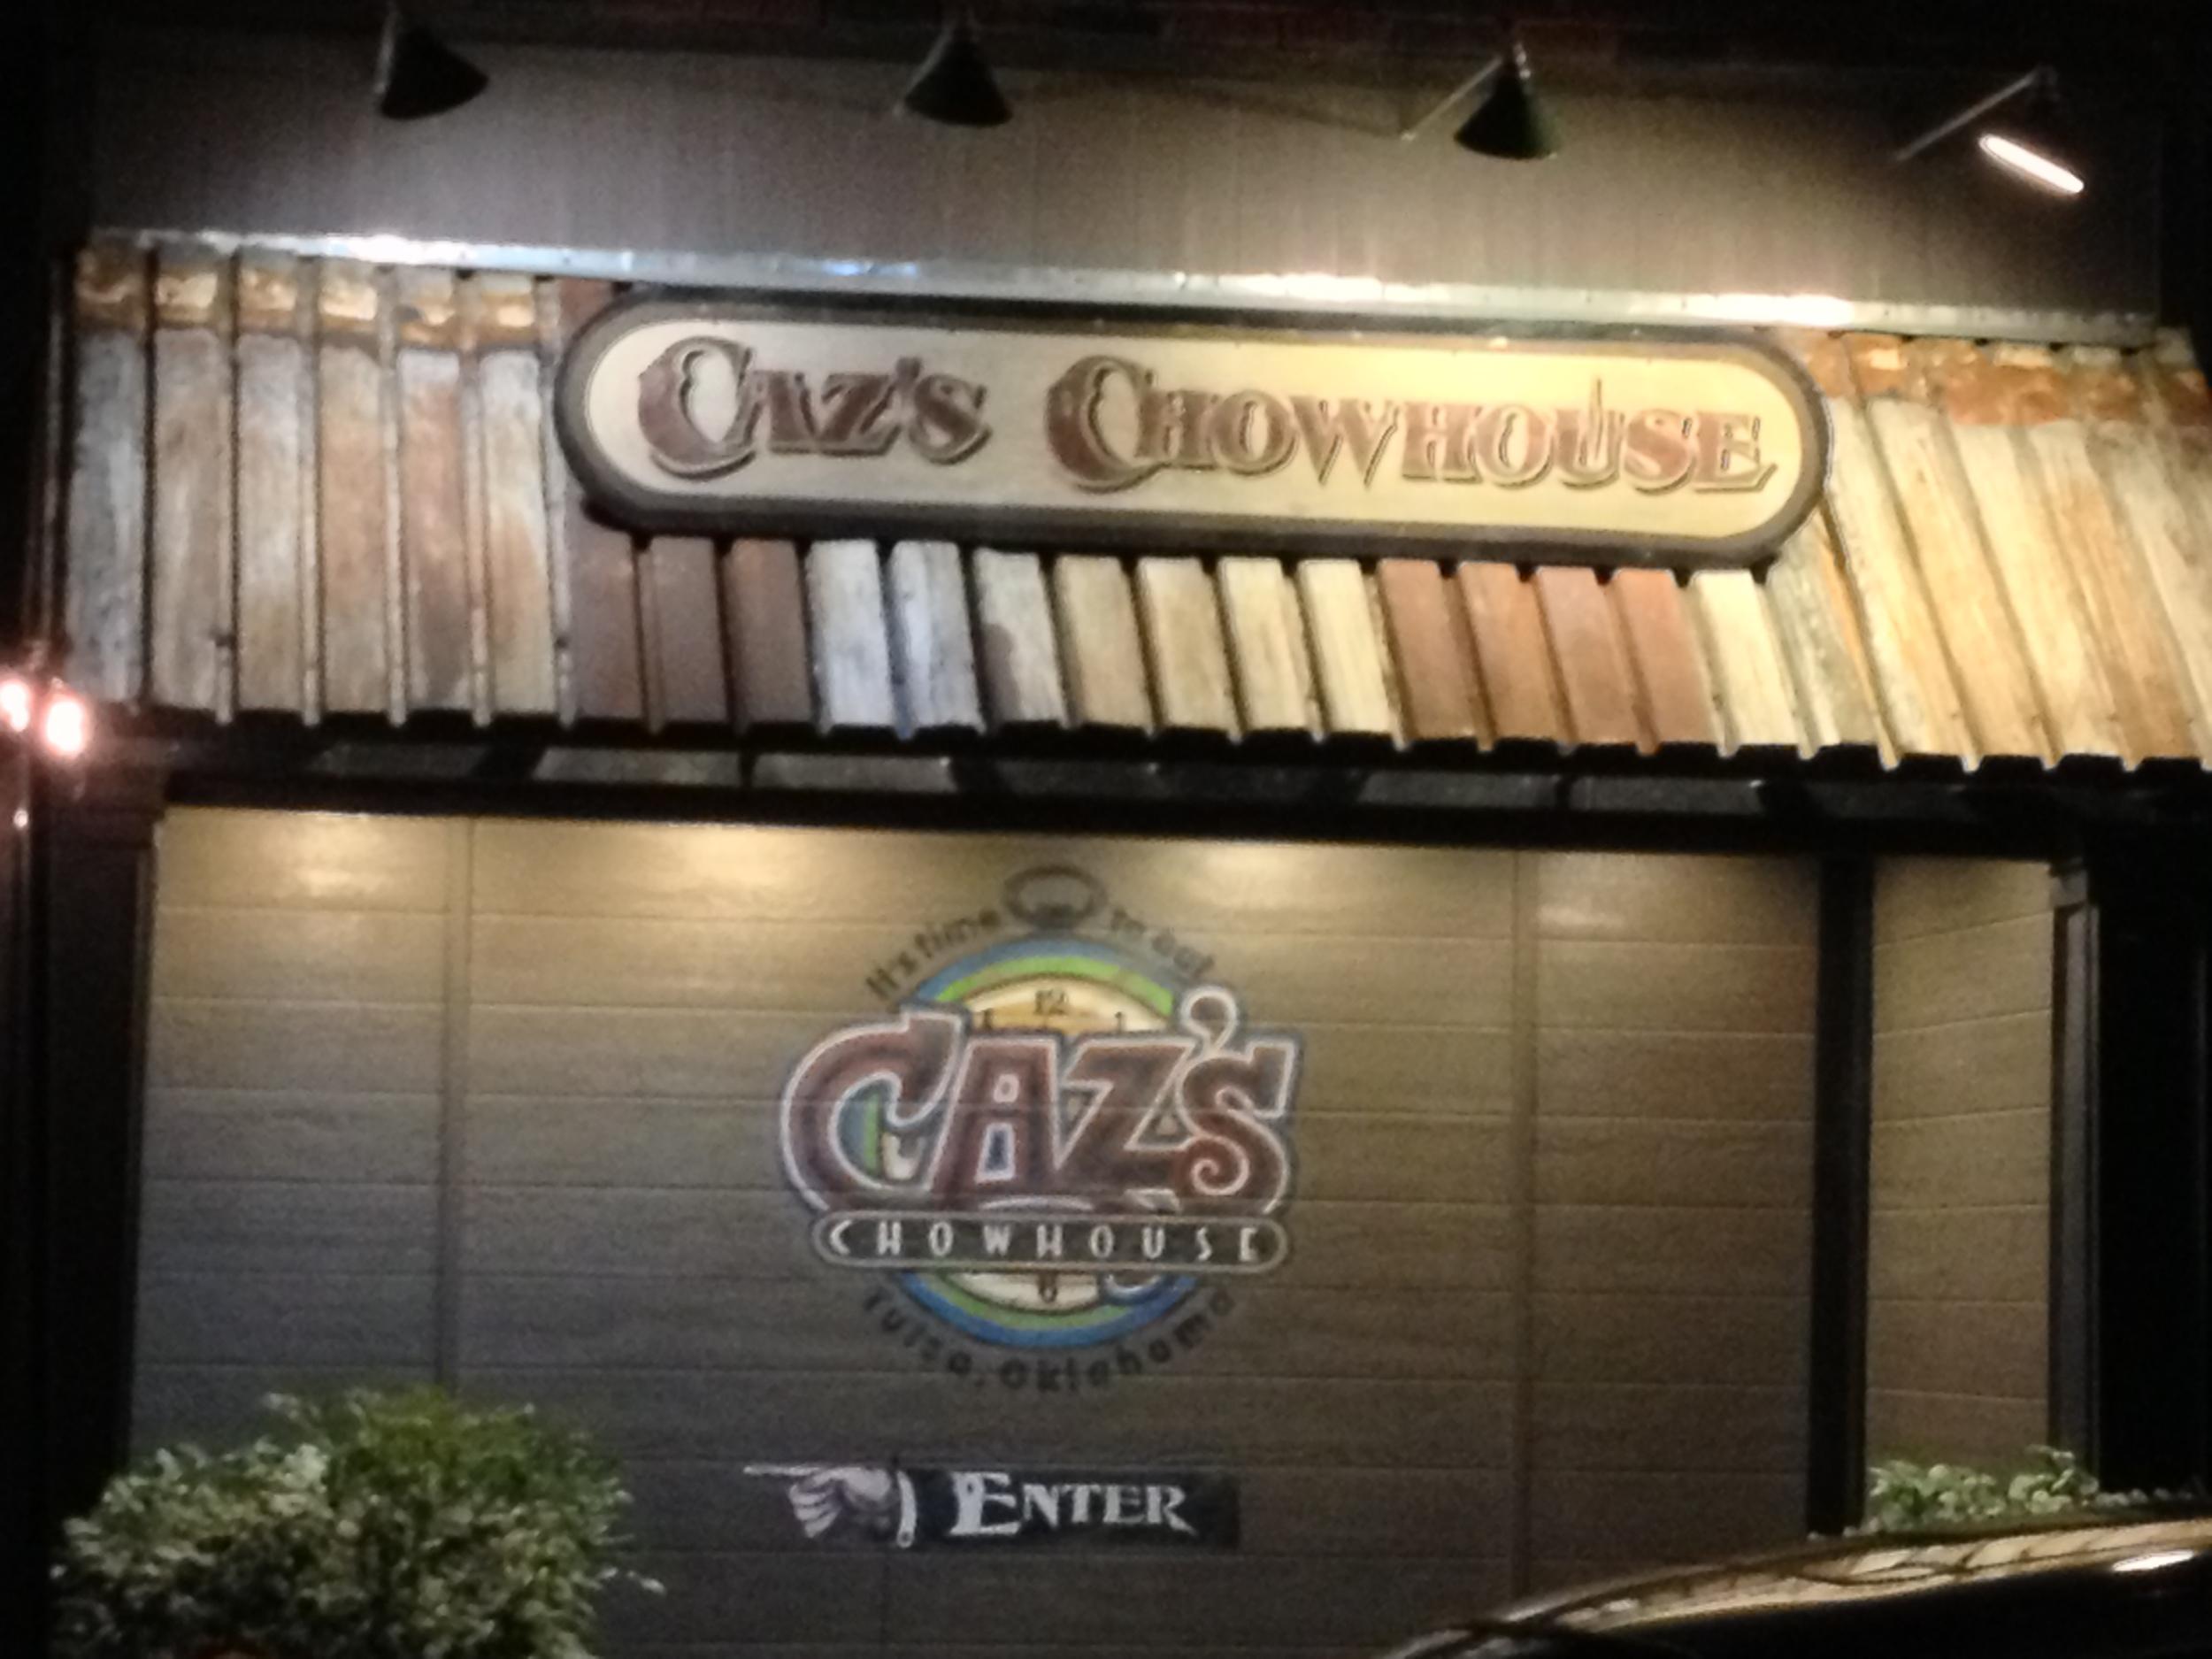 Cazs ChowtulsaHouse in Downtown Tulsa